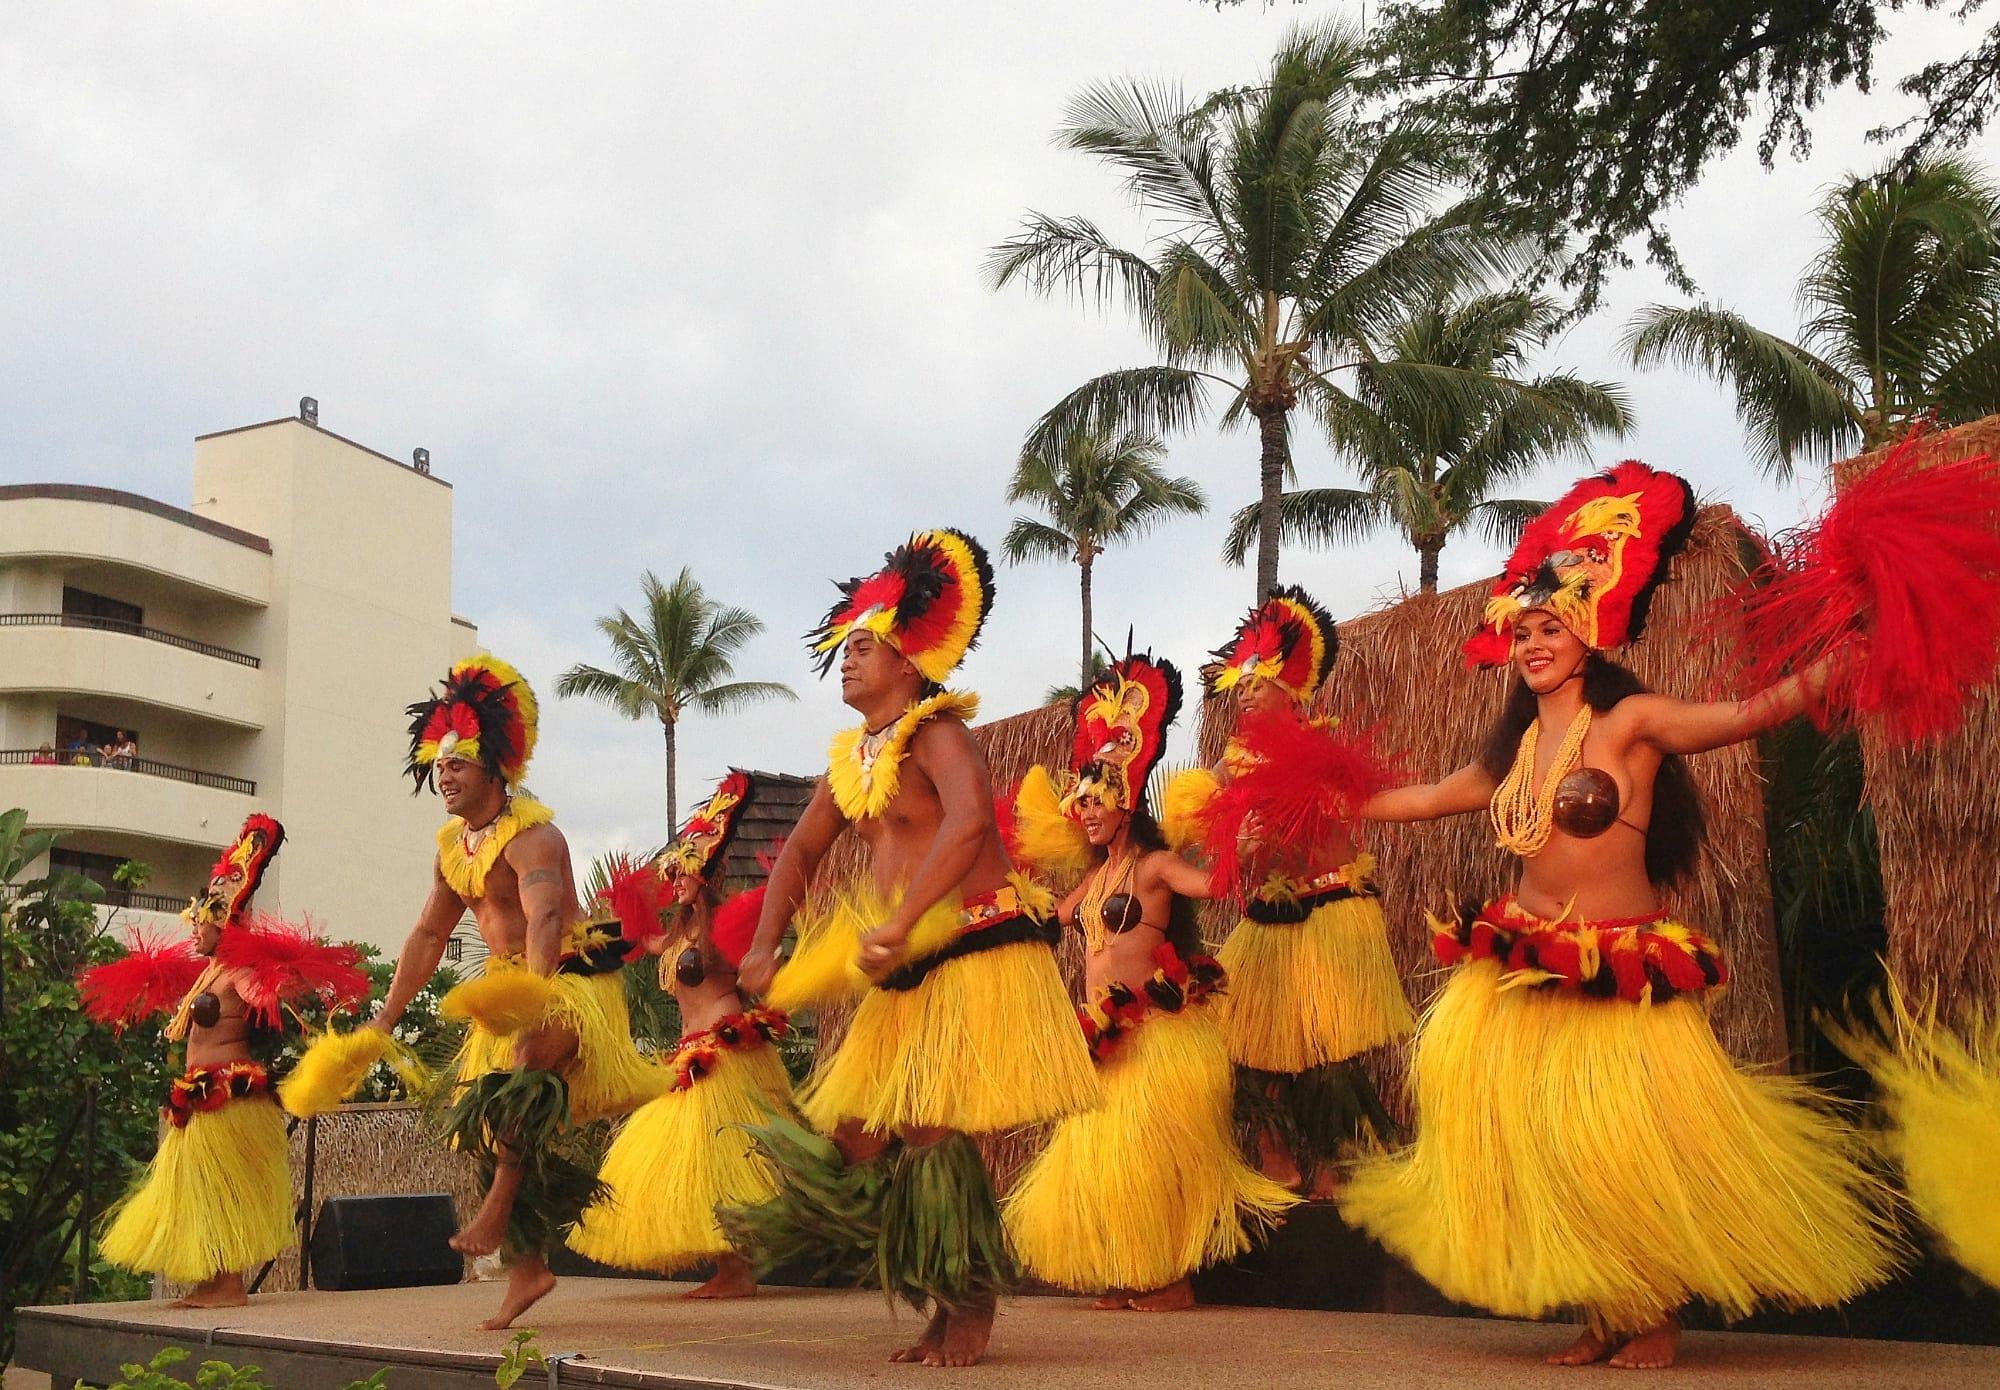 Maui Nui Luau at Black Rock, hosted by the Sheraton Maui Resort & Spa ~ Kaanapali with kids